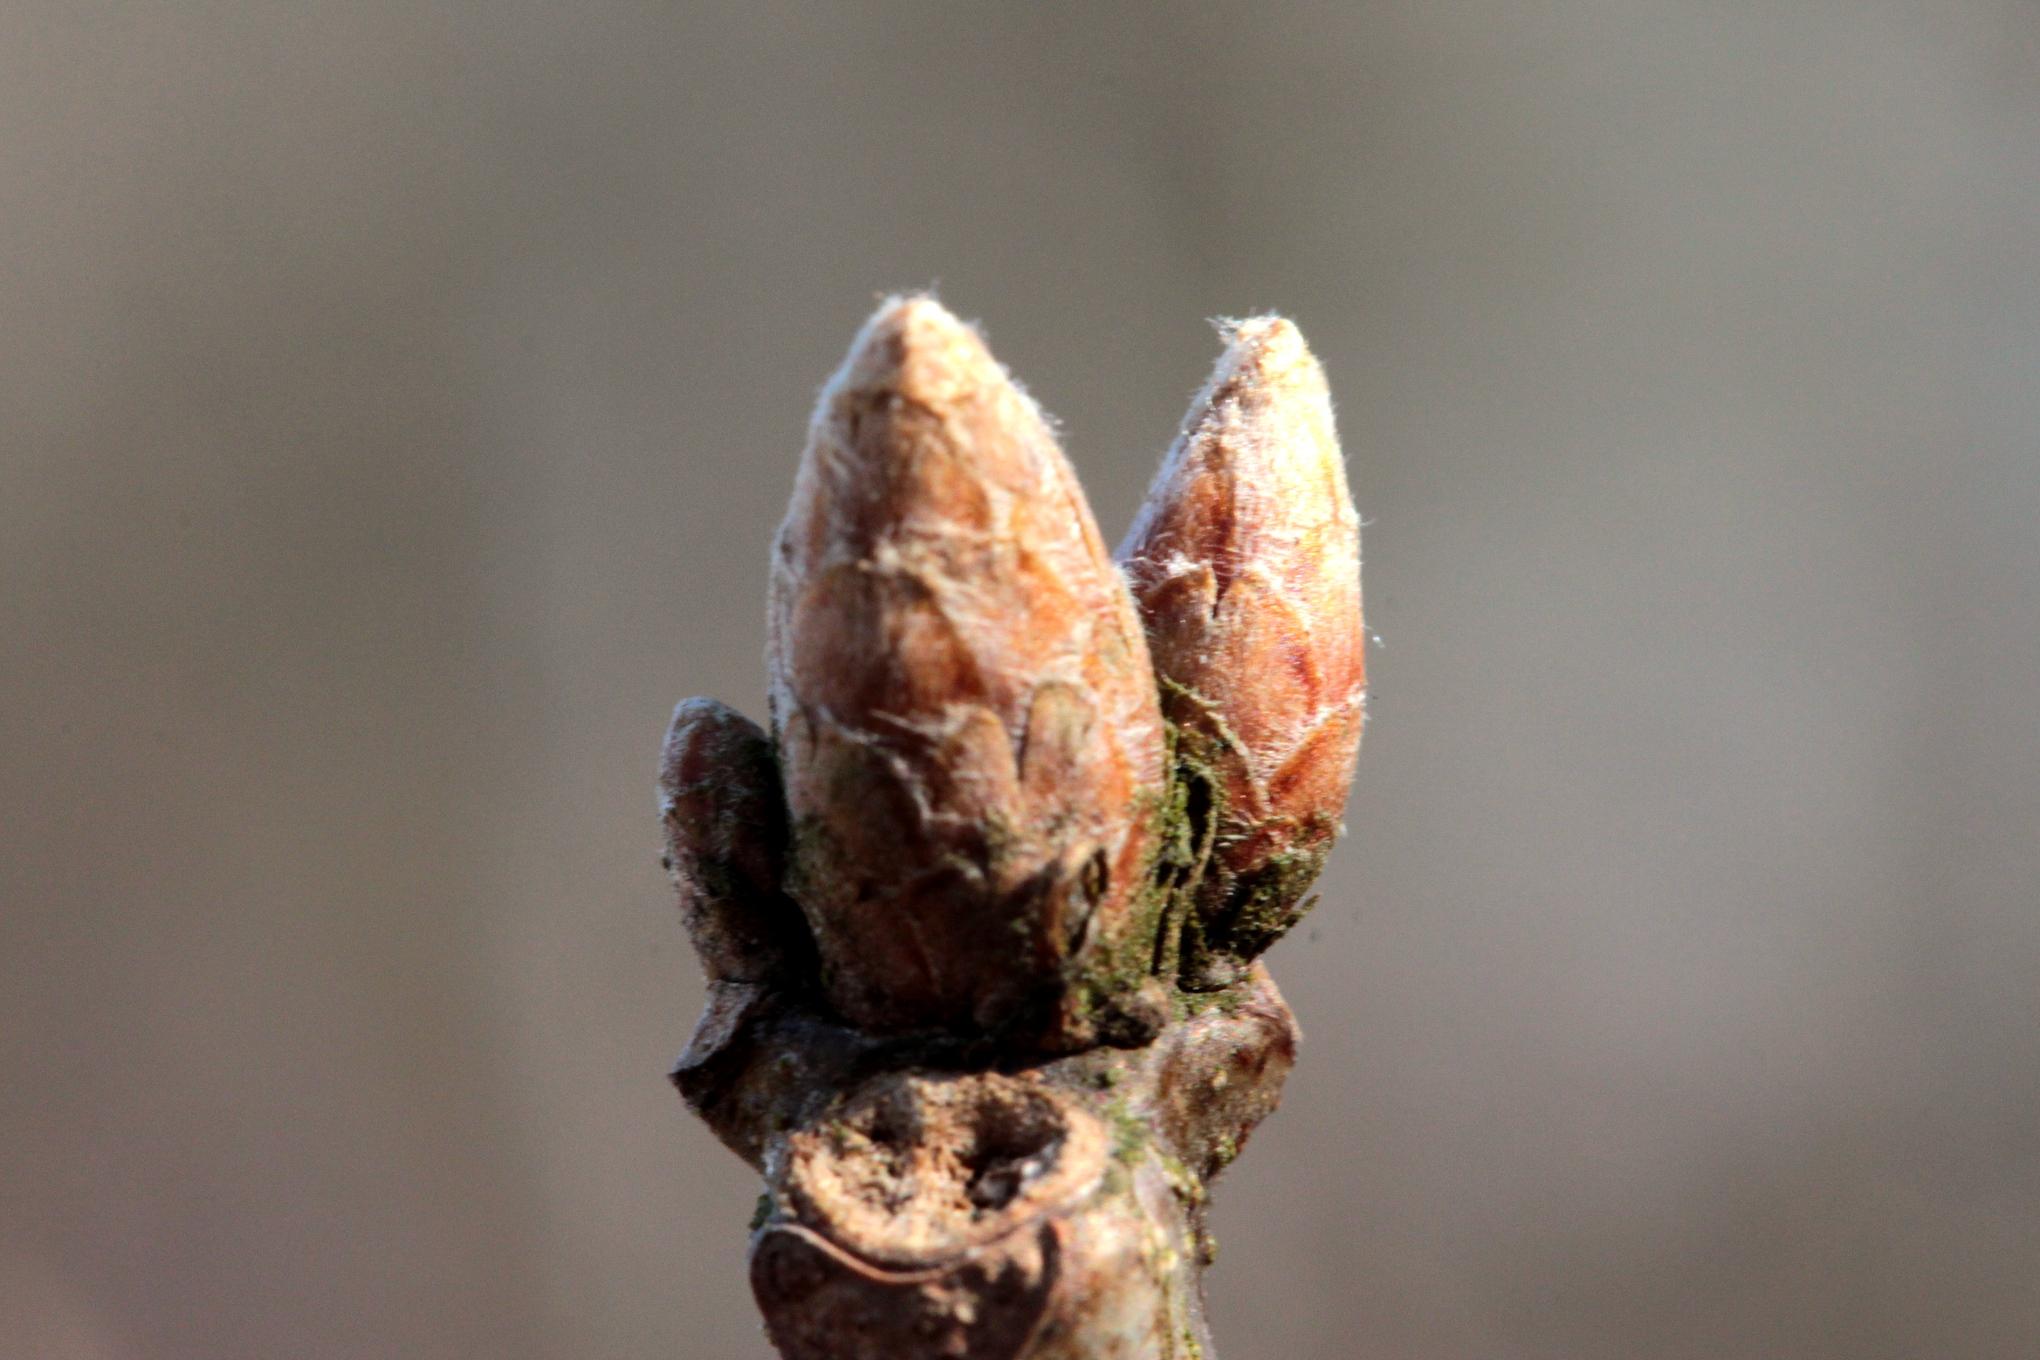 Quercus Velutina Buds File:2013-04-02 1 Quer...